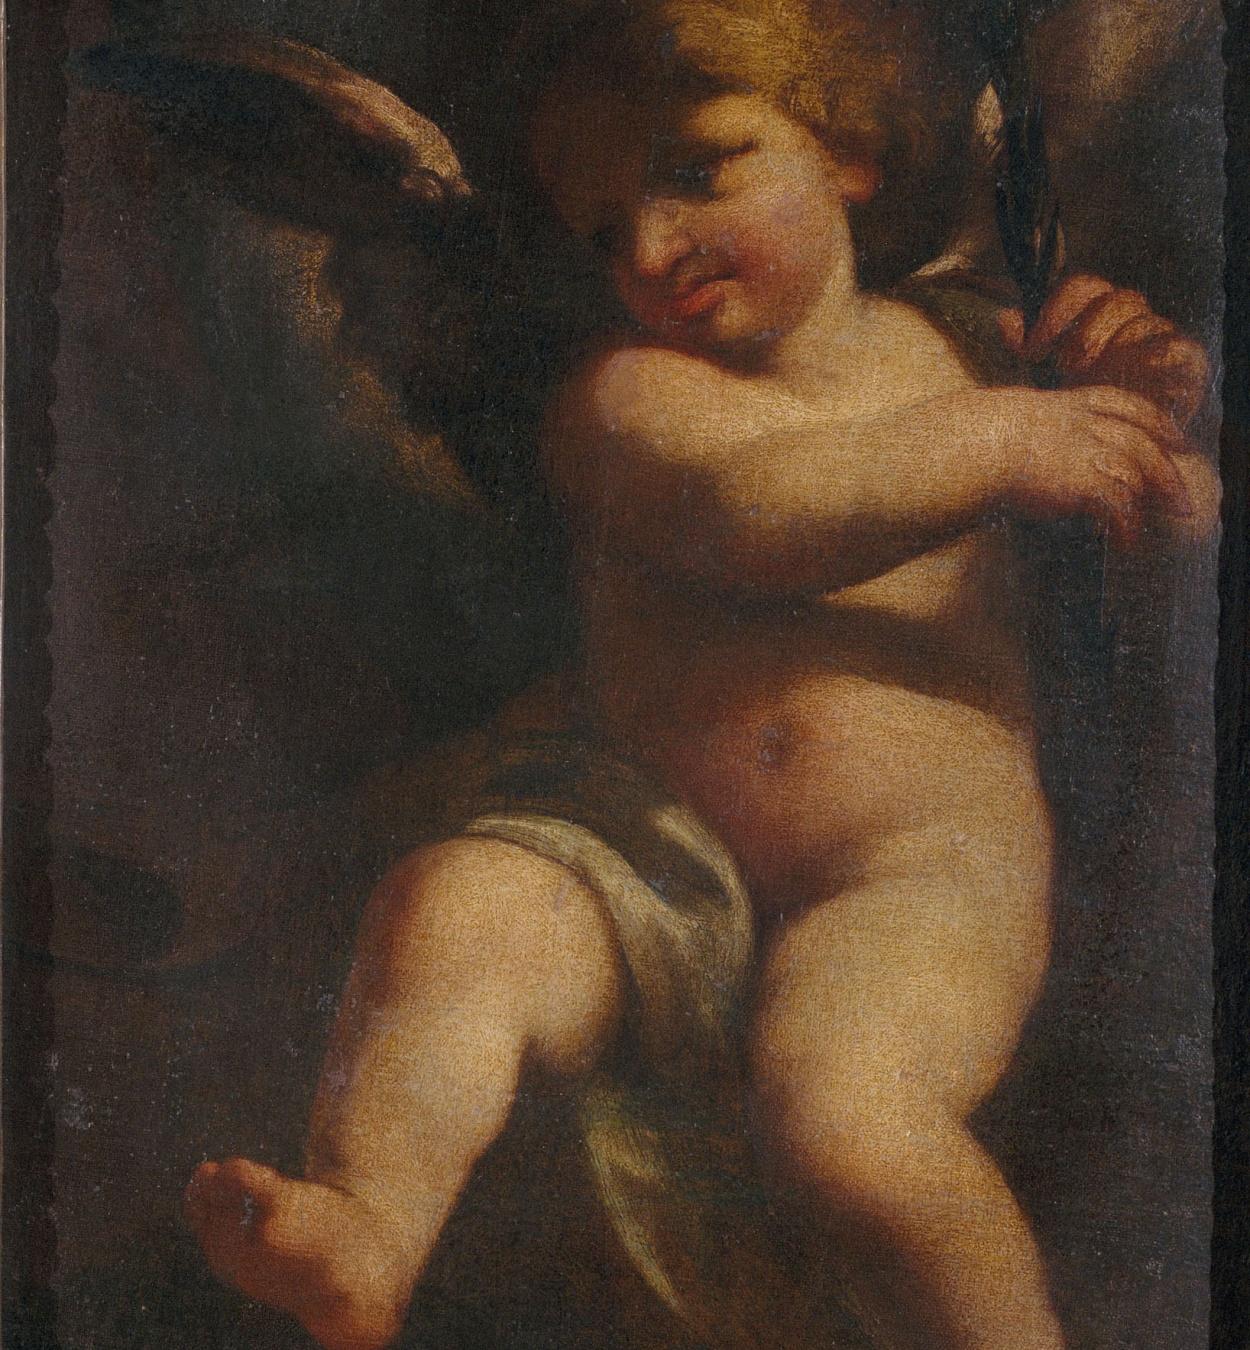 Pere Cuquet - Little Angel - 17th century